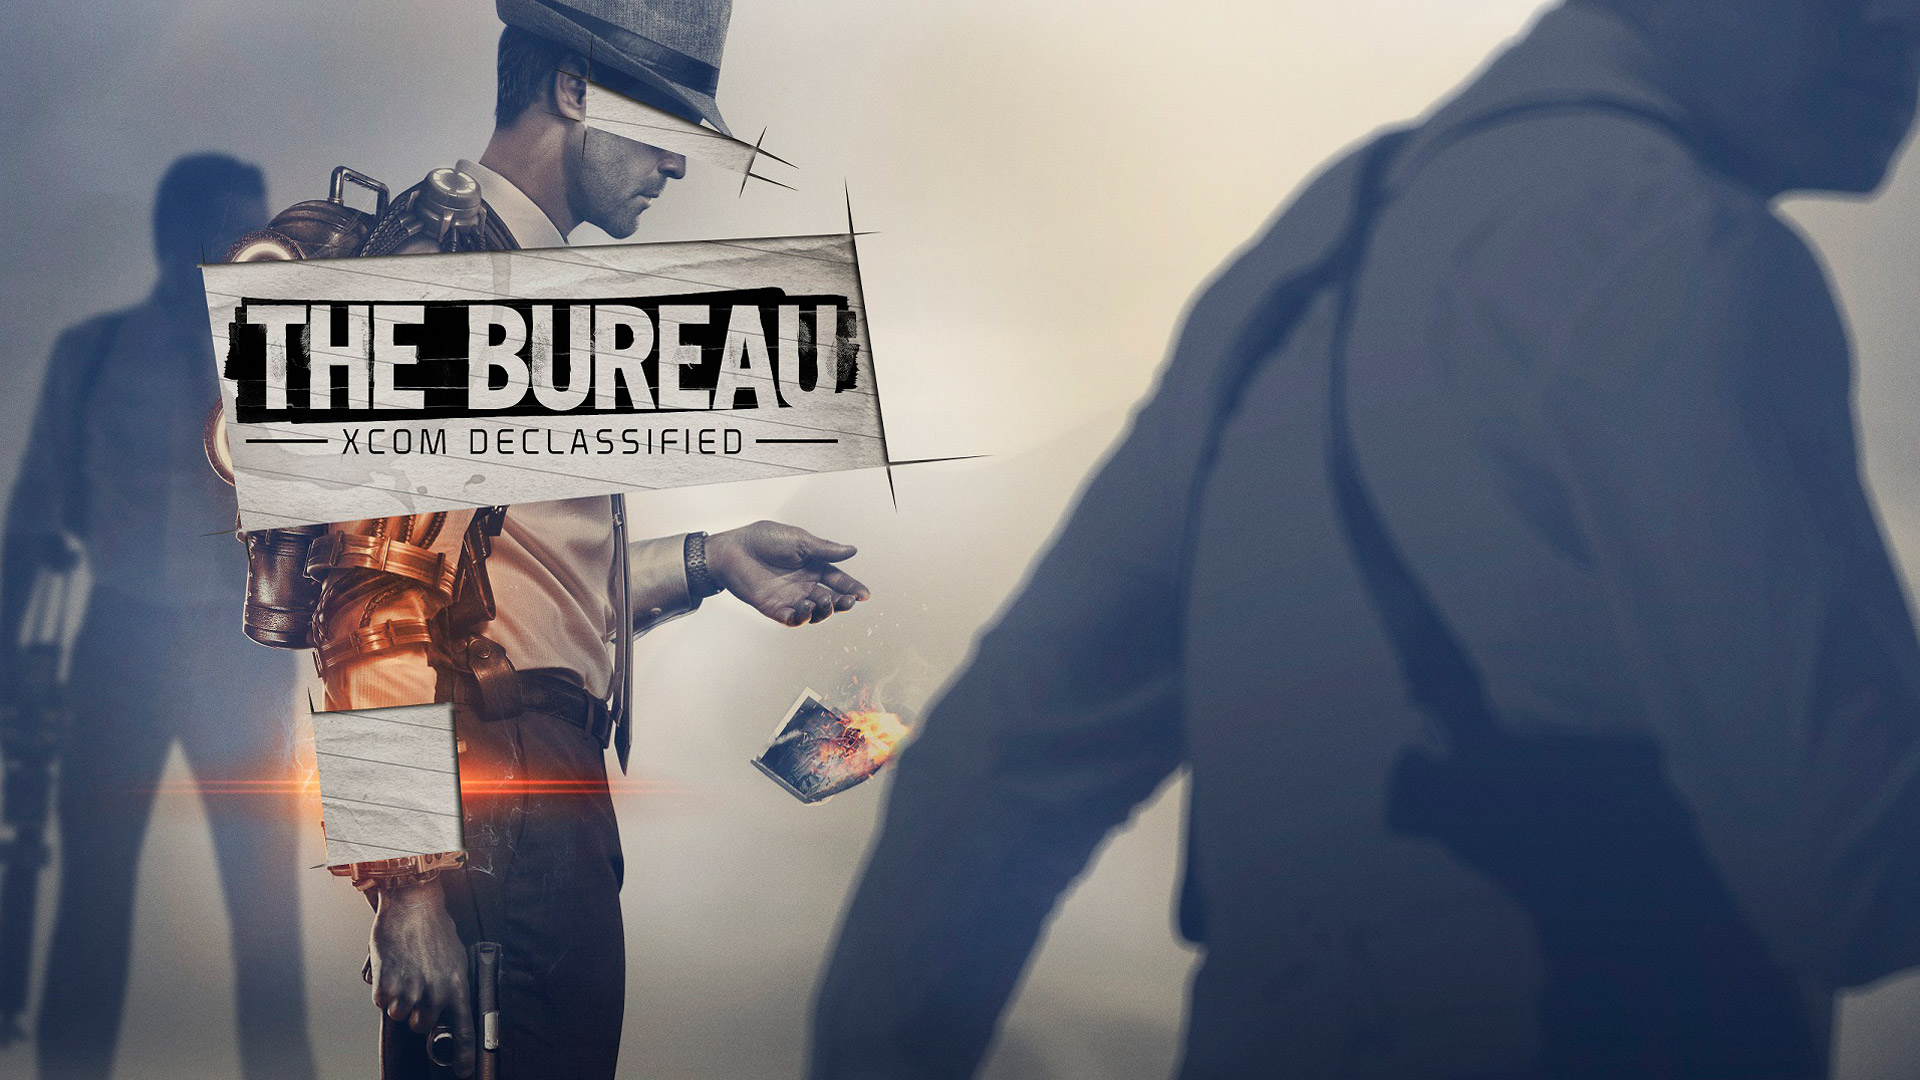 Free The Bureau: XCOM Declassified Wallpaper in 1920x1080